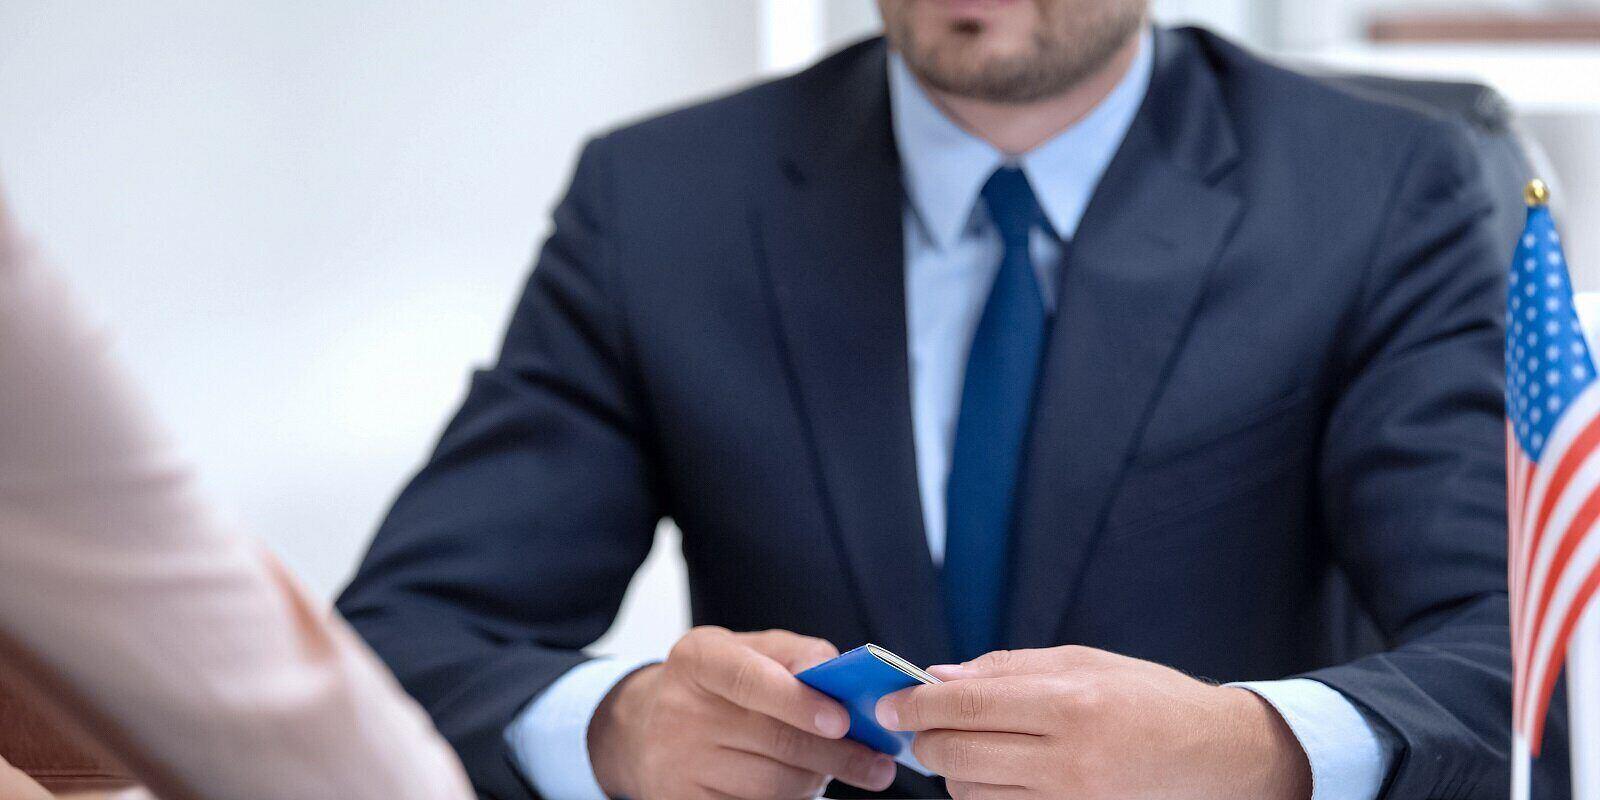 man holding passport preparing for k1 visa interview